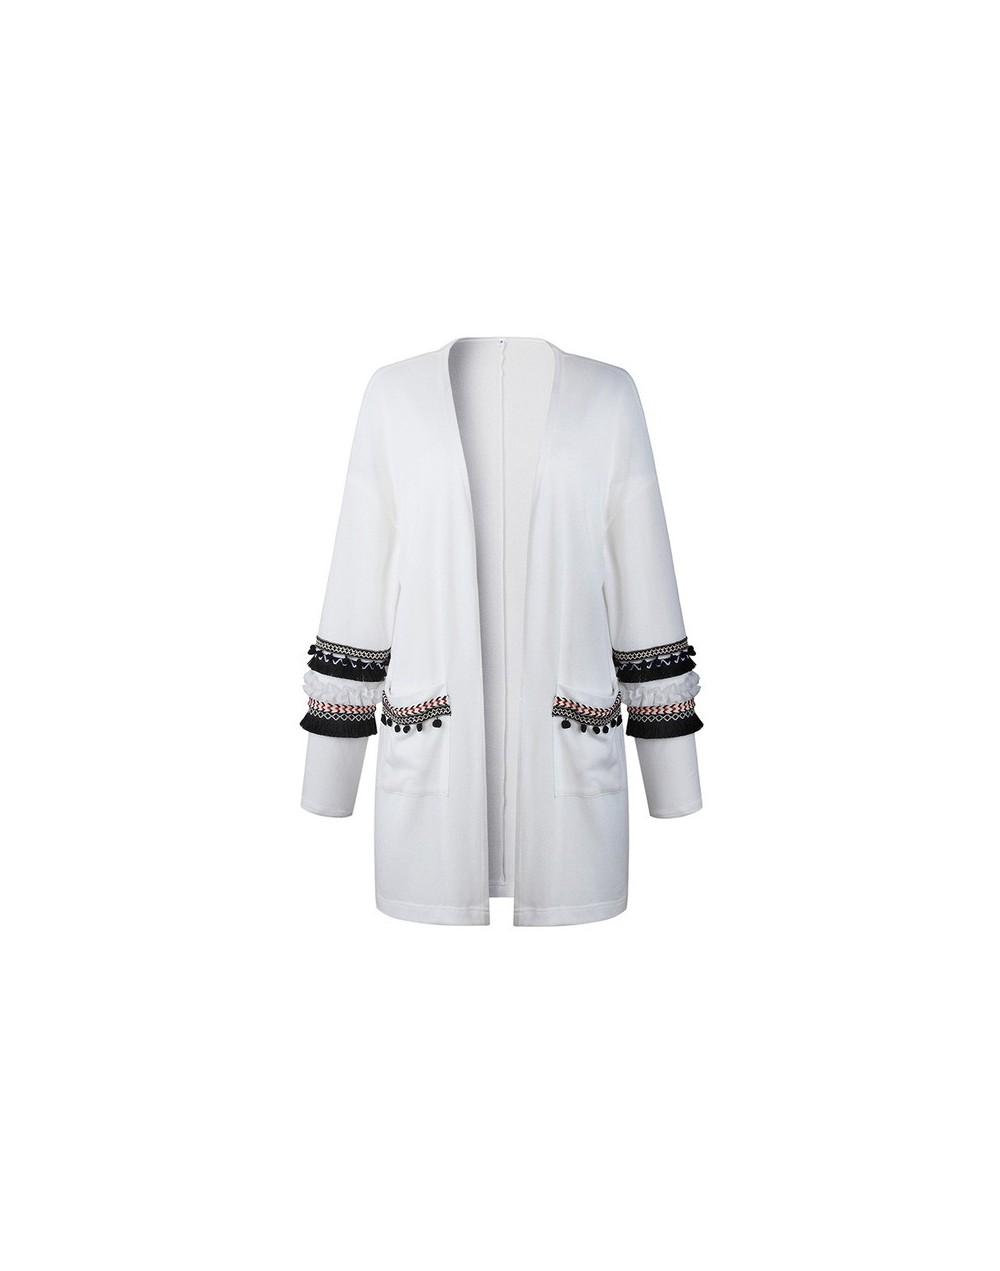 Long Sleeve Cardigan Ladies Winter Knitted Boho Female Sweater Cardigan Floral Outerwear Tassel Spanish Elegant Casual Long ...